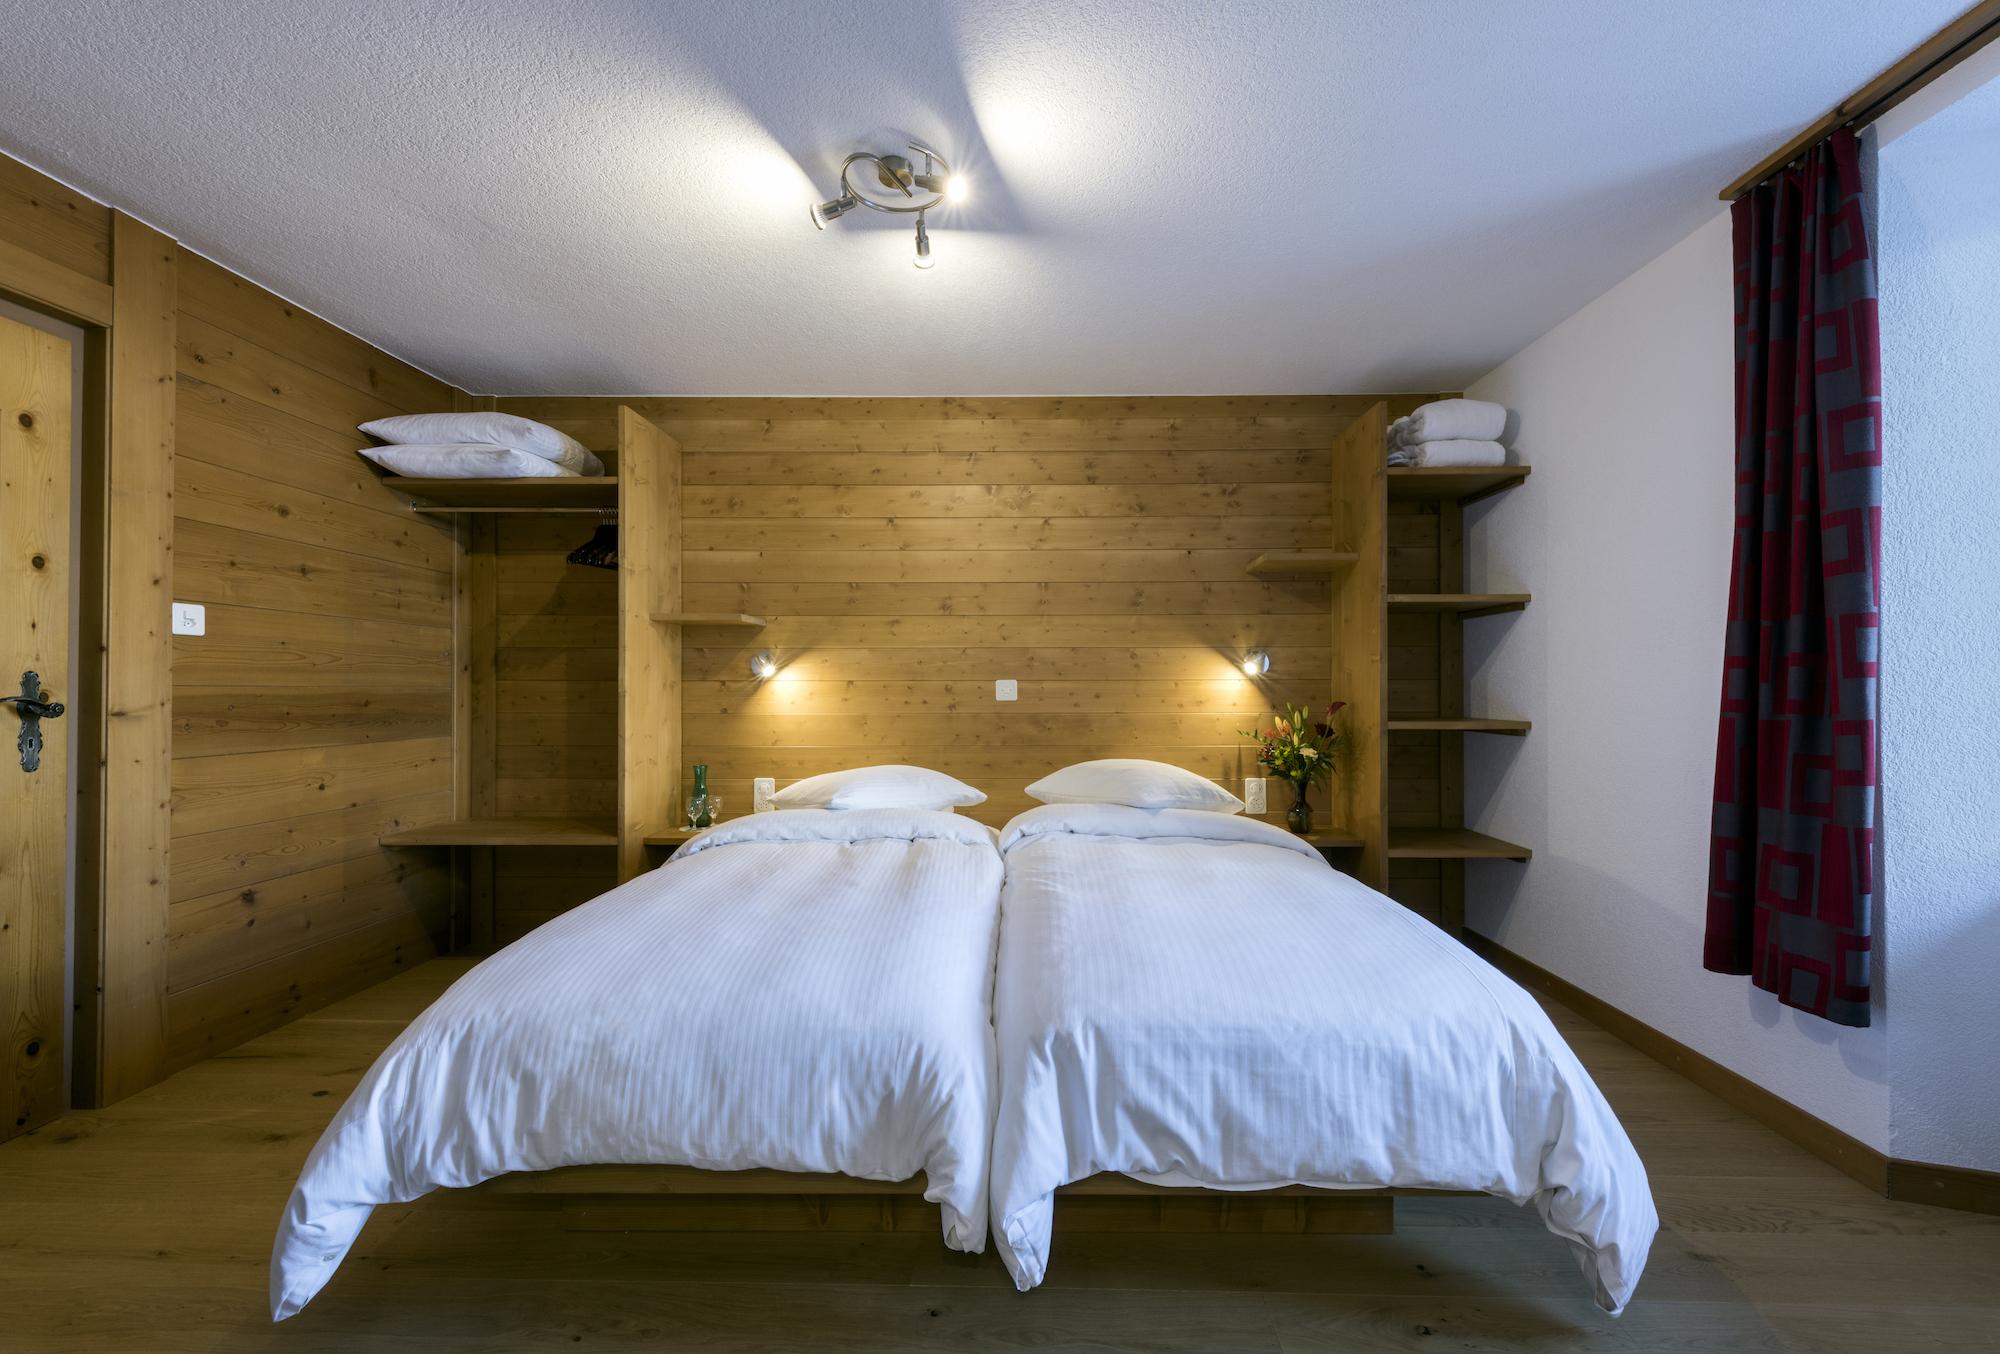 Hotel_La_Vallee-36.jpg